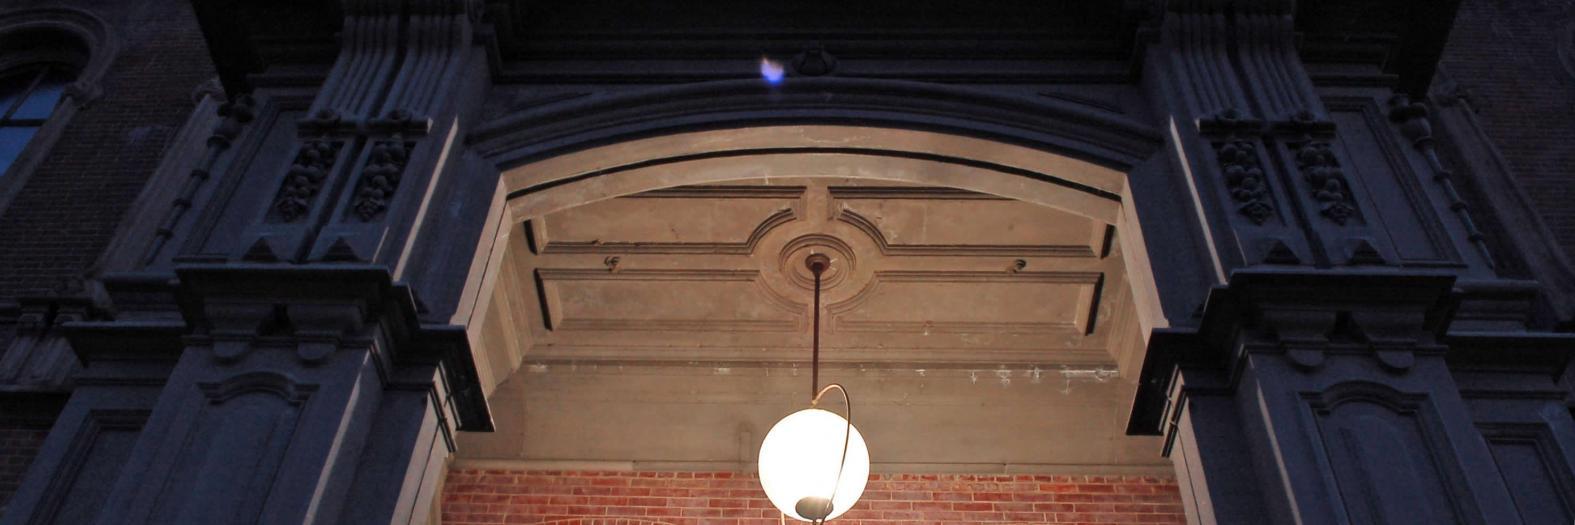 southhall-front-door-night.jpg